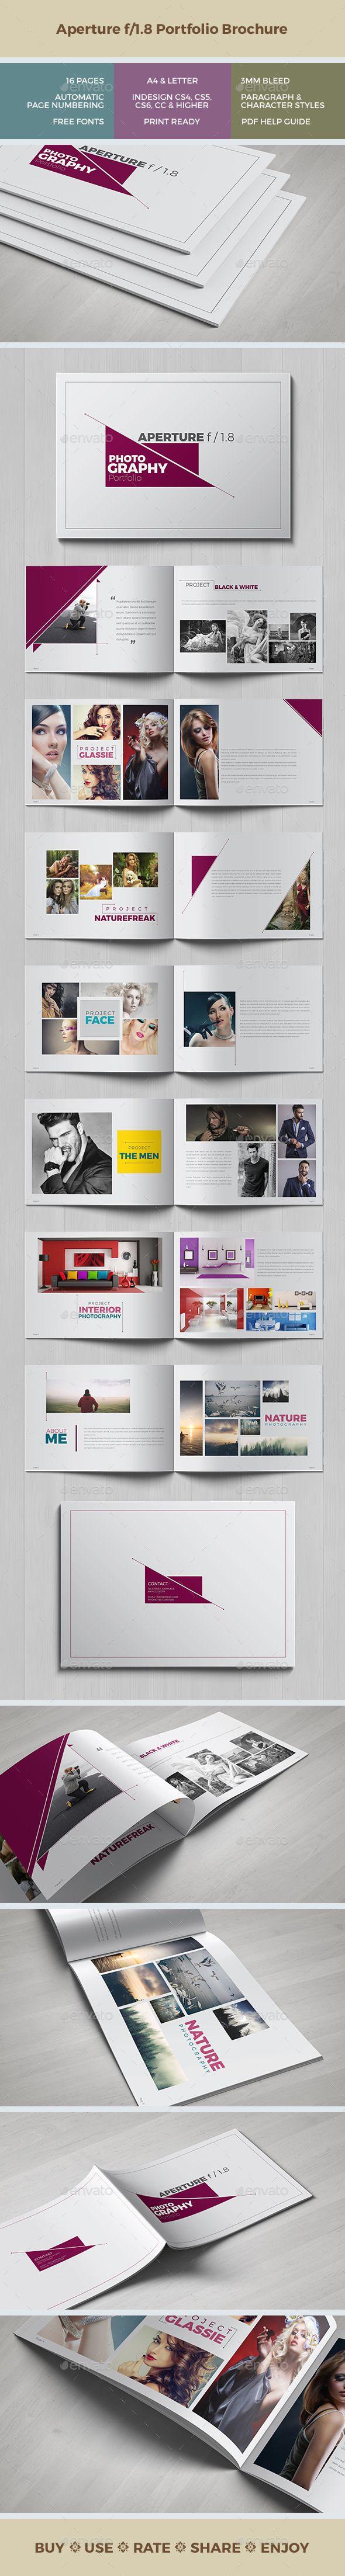 Aperture f/1.8 Portfolio - 16 Pages Template InDesign INDD #design Download: http://graphicriver.net/item/aperture-f18-portfolio-16-pages/14071861?ref=ksioks